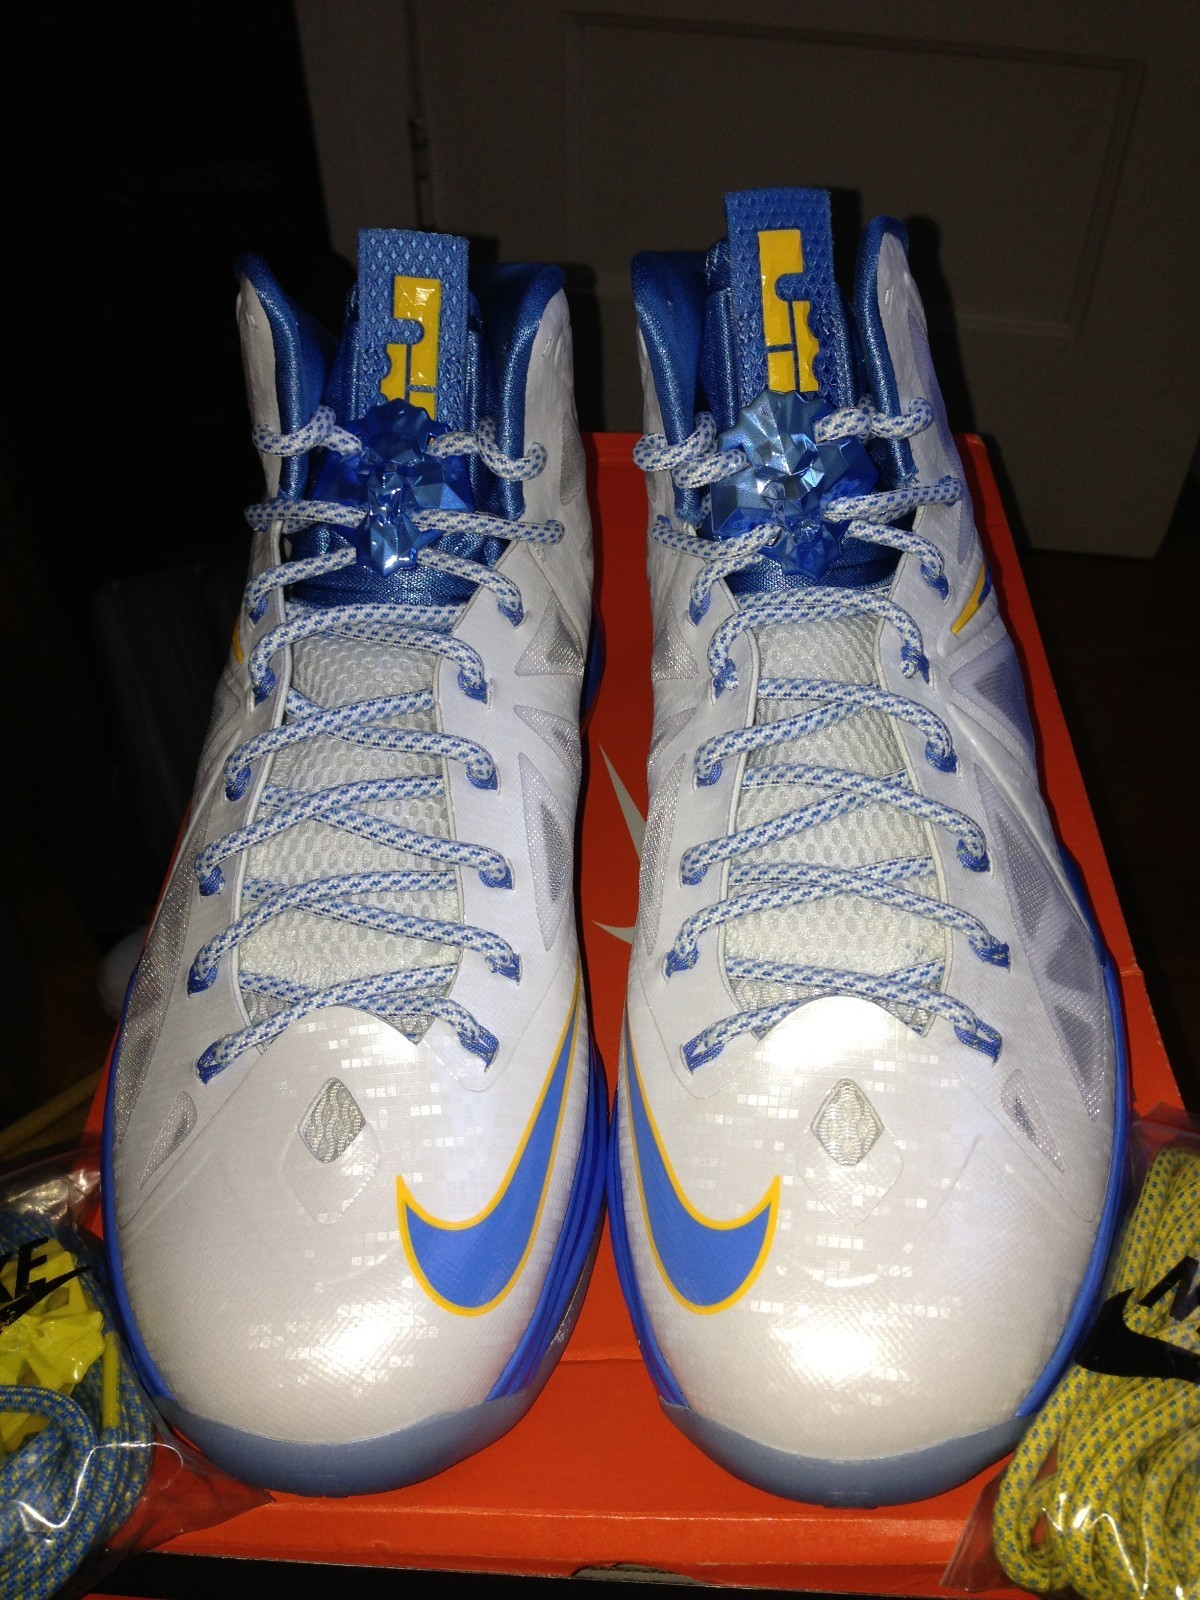 new styles 6f695 fc215 60%OFF Nike LeBron X 10 Swin Cash Home PE